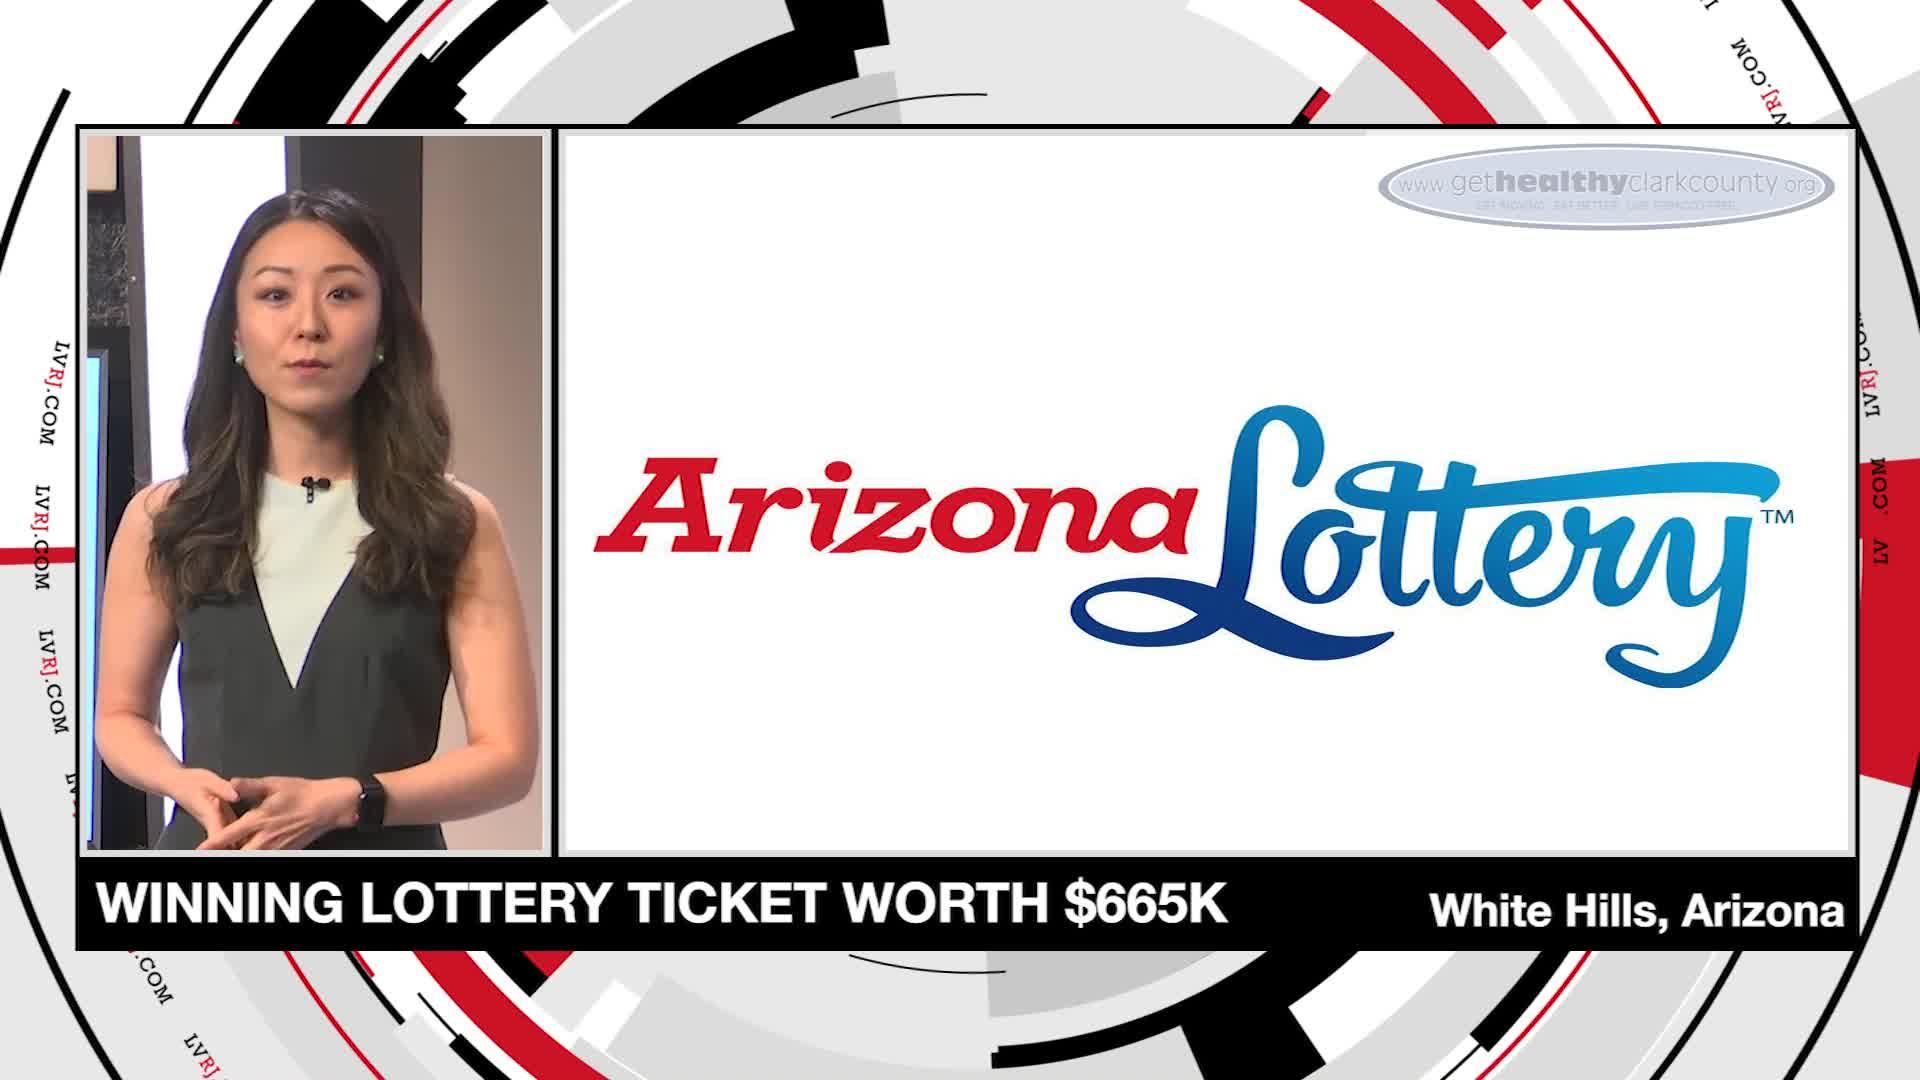 7@7PM Winning Lottery Ticket Worth $665K